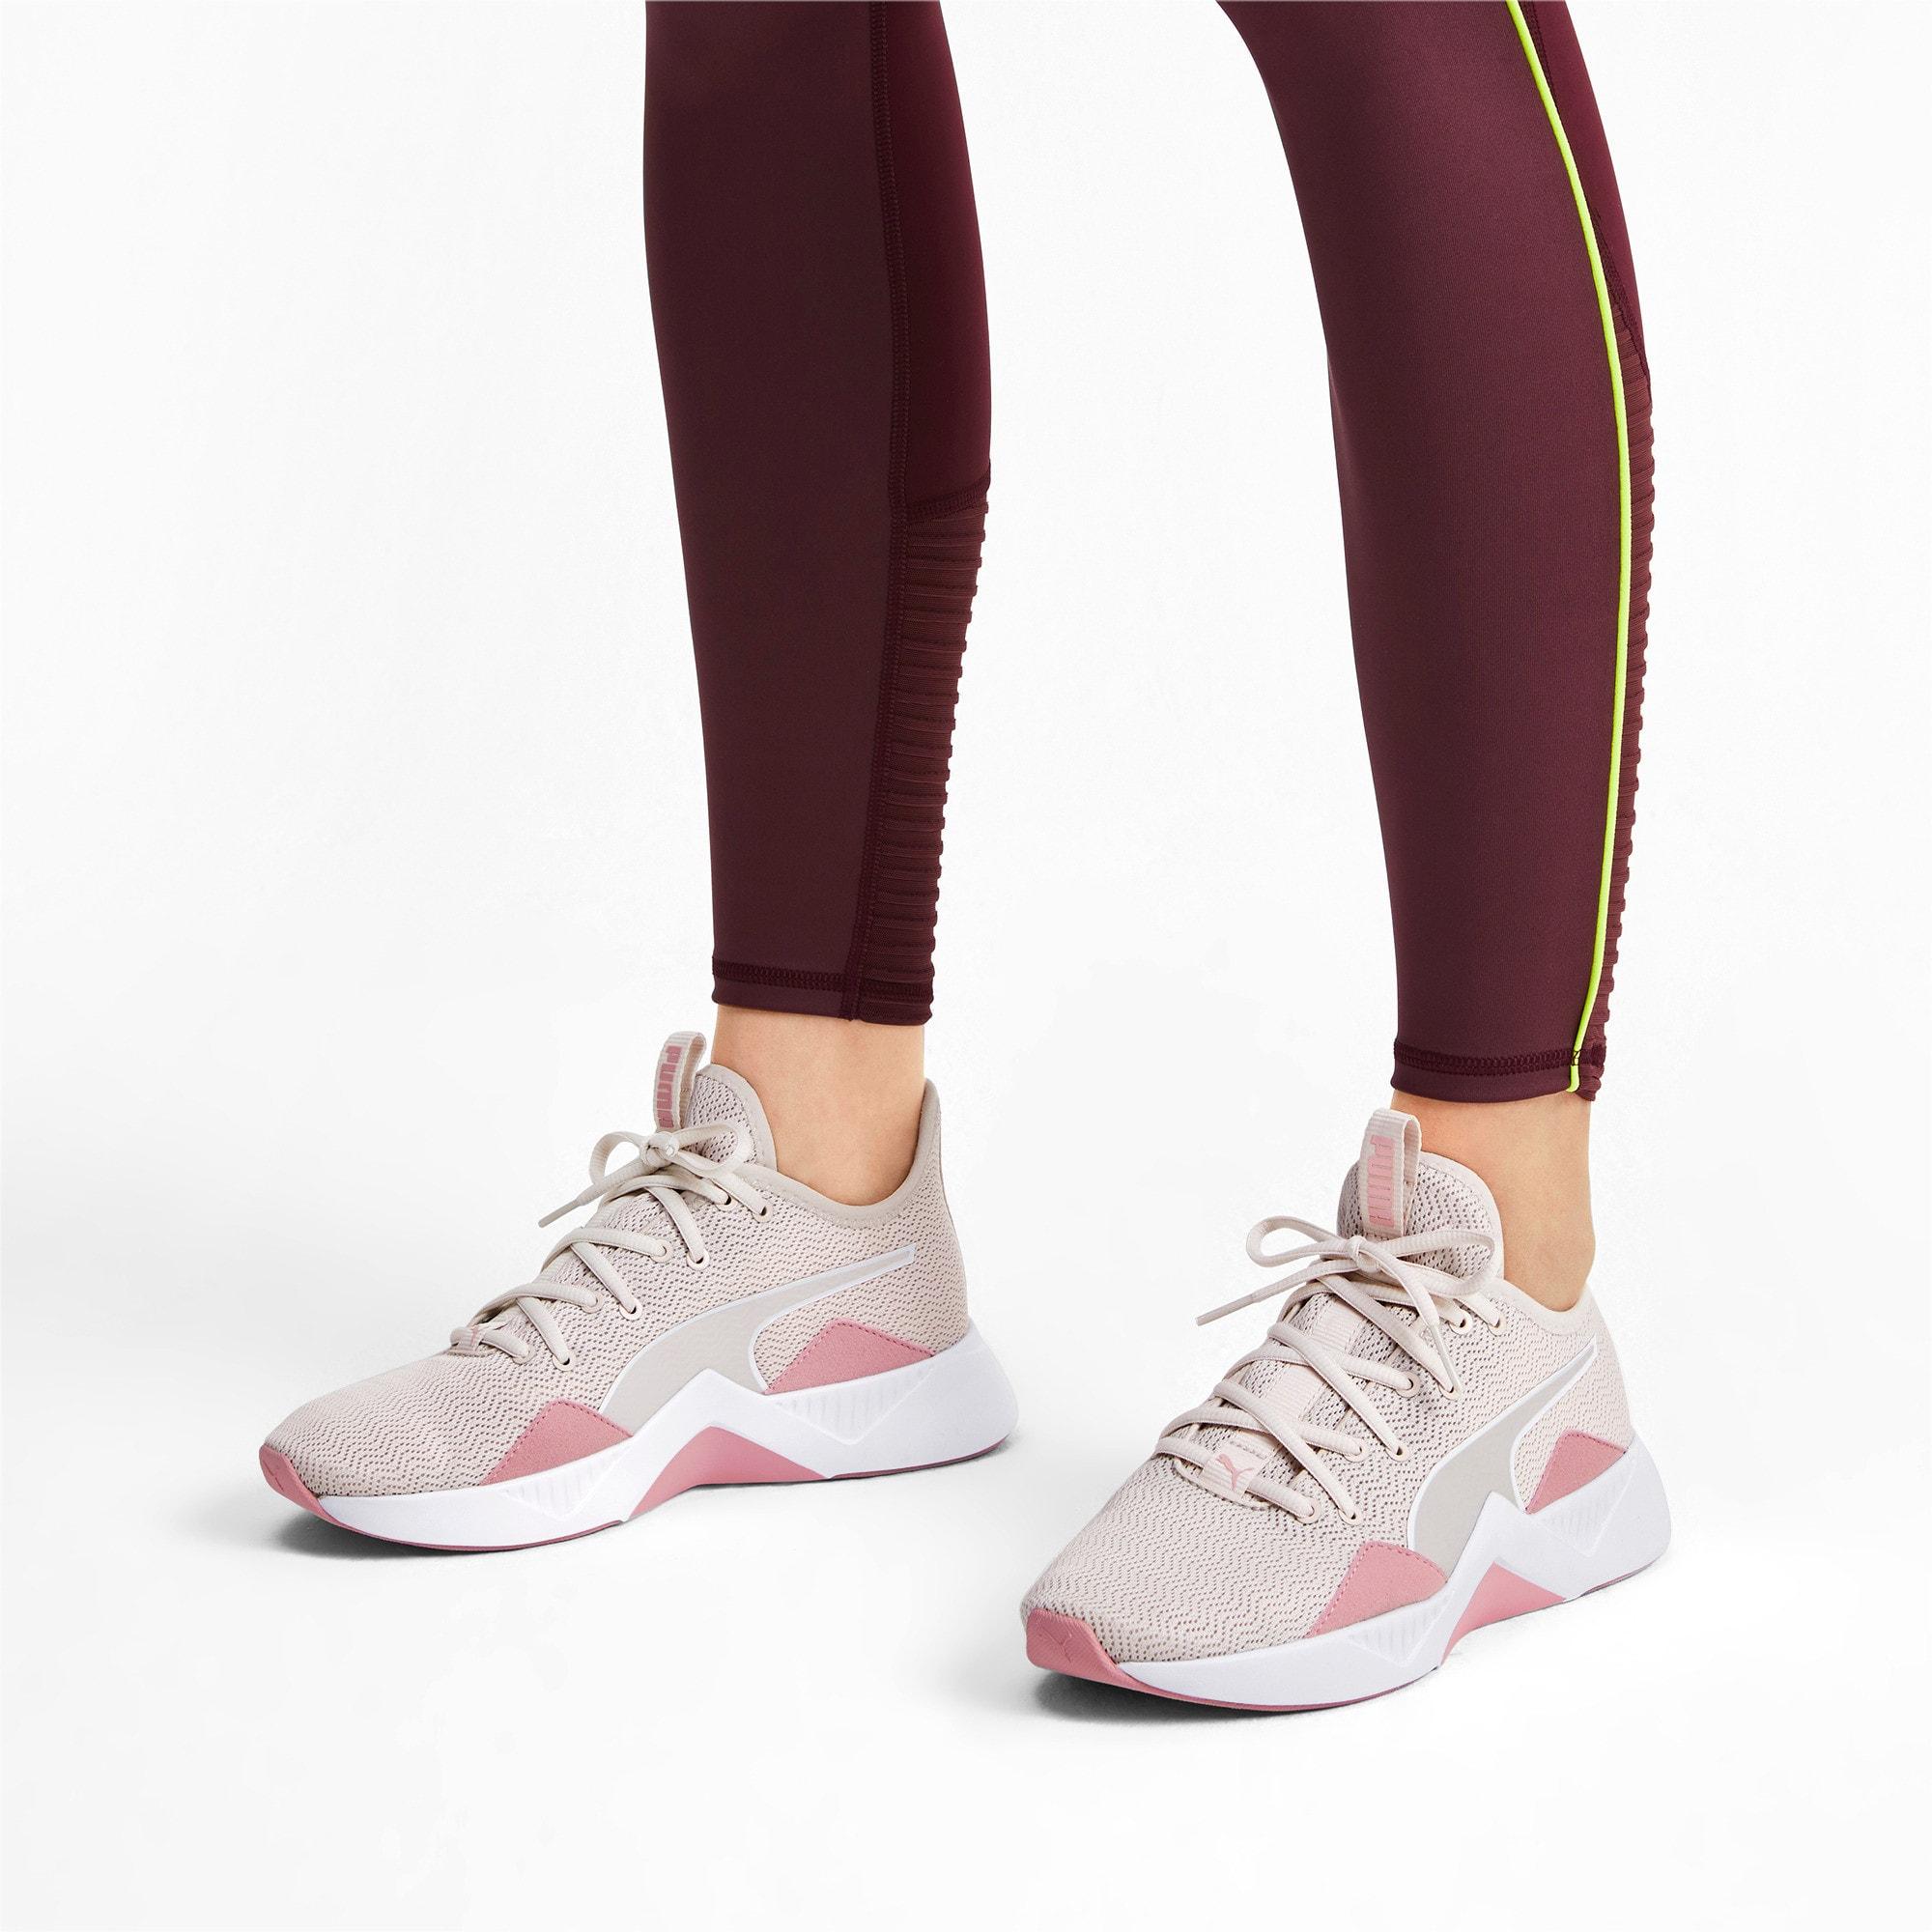 Thumbnail 3 of Incite FS Shift Women's Training Shoes, Pastel Parchment-Rose-White, medium